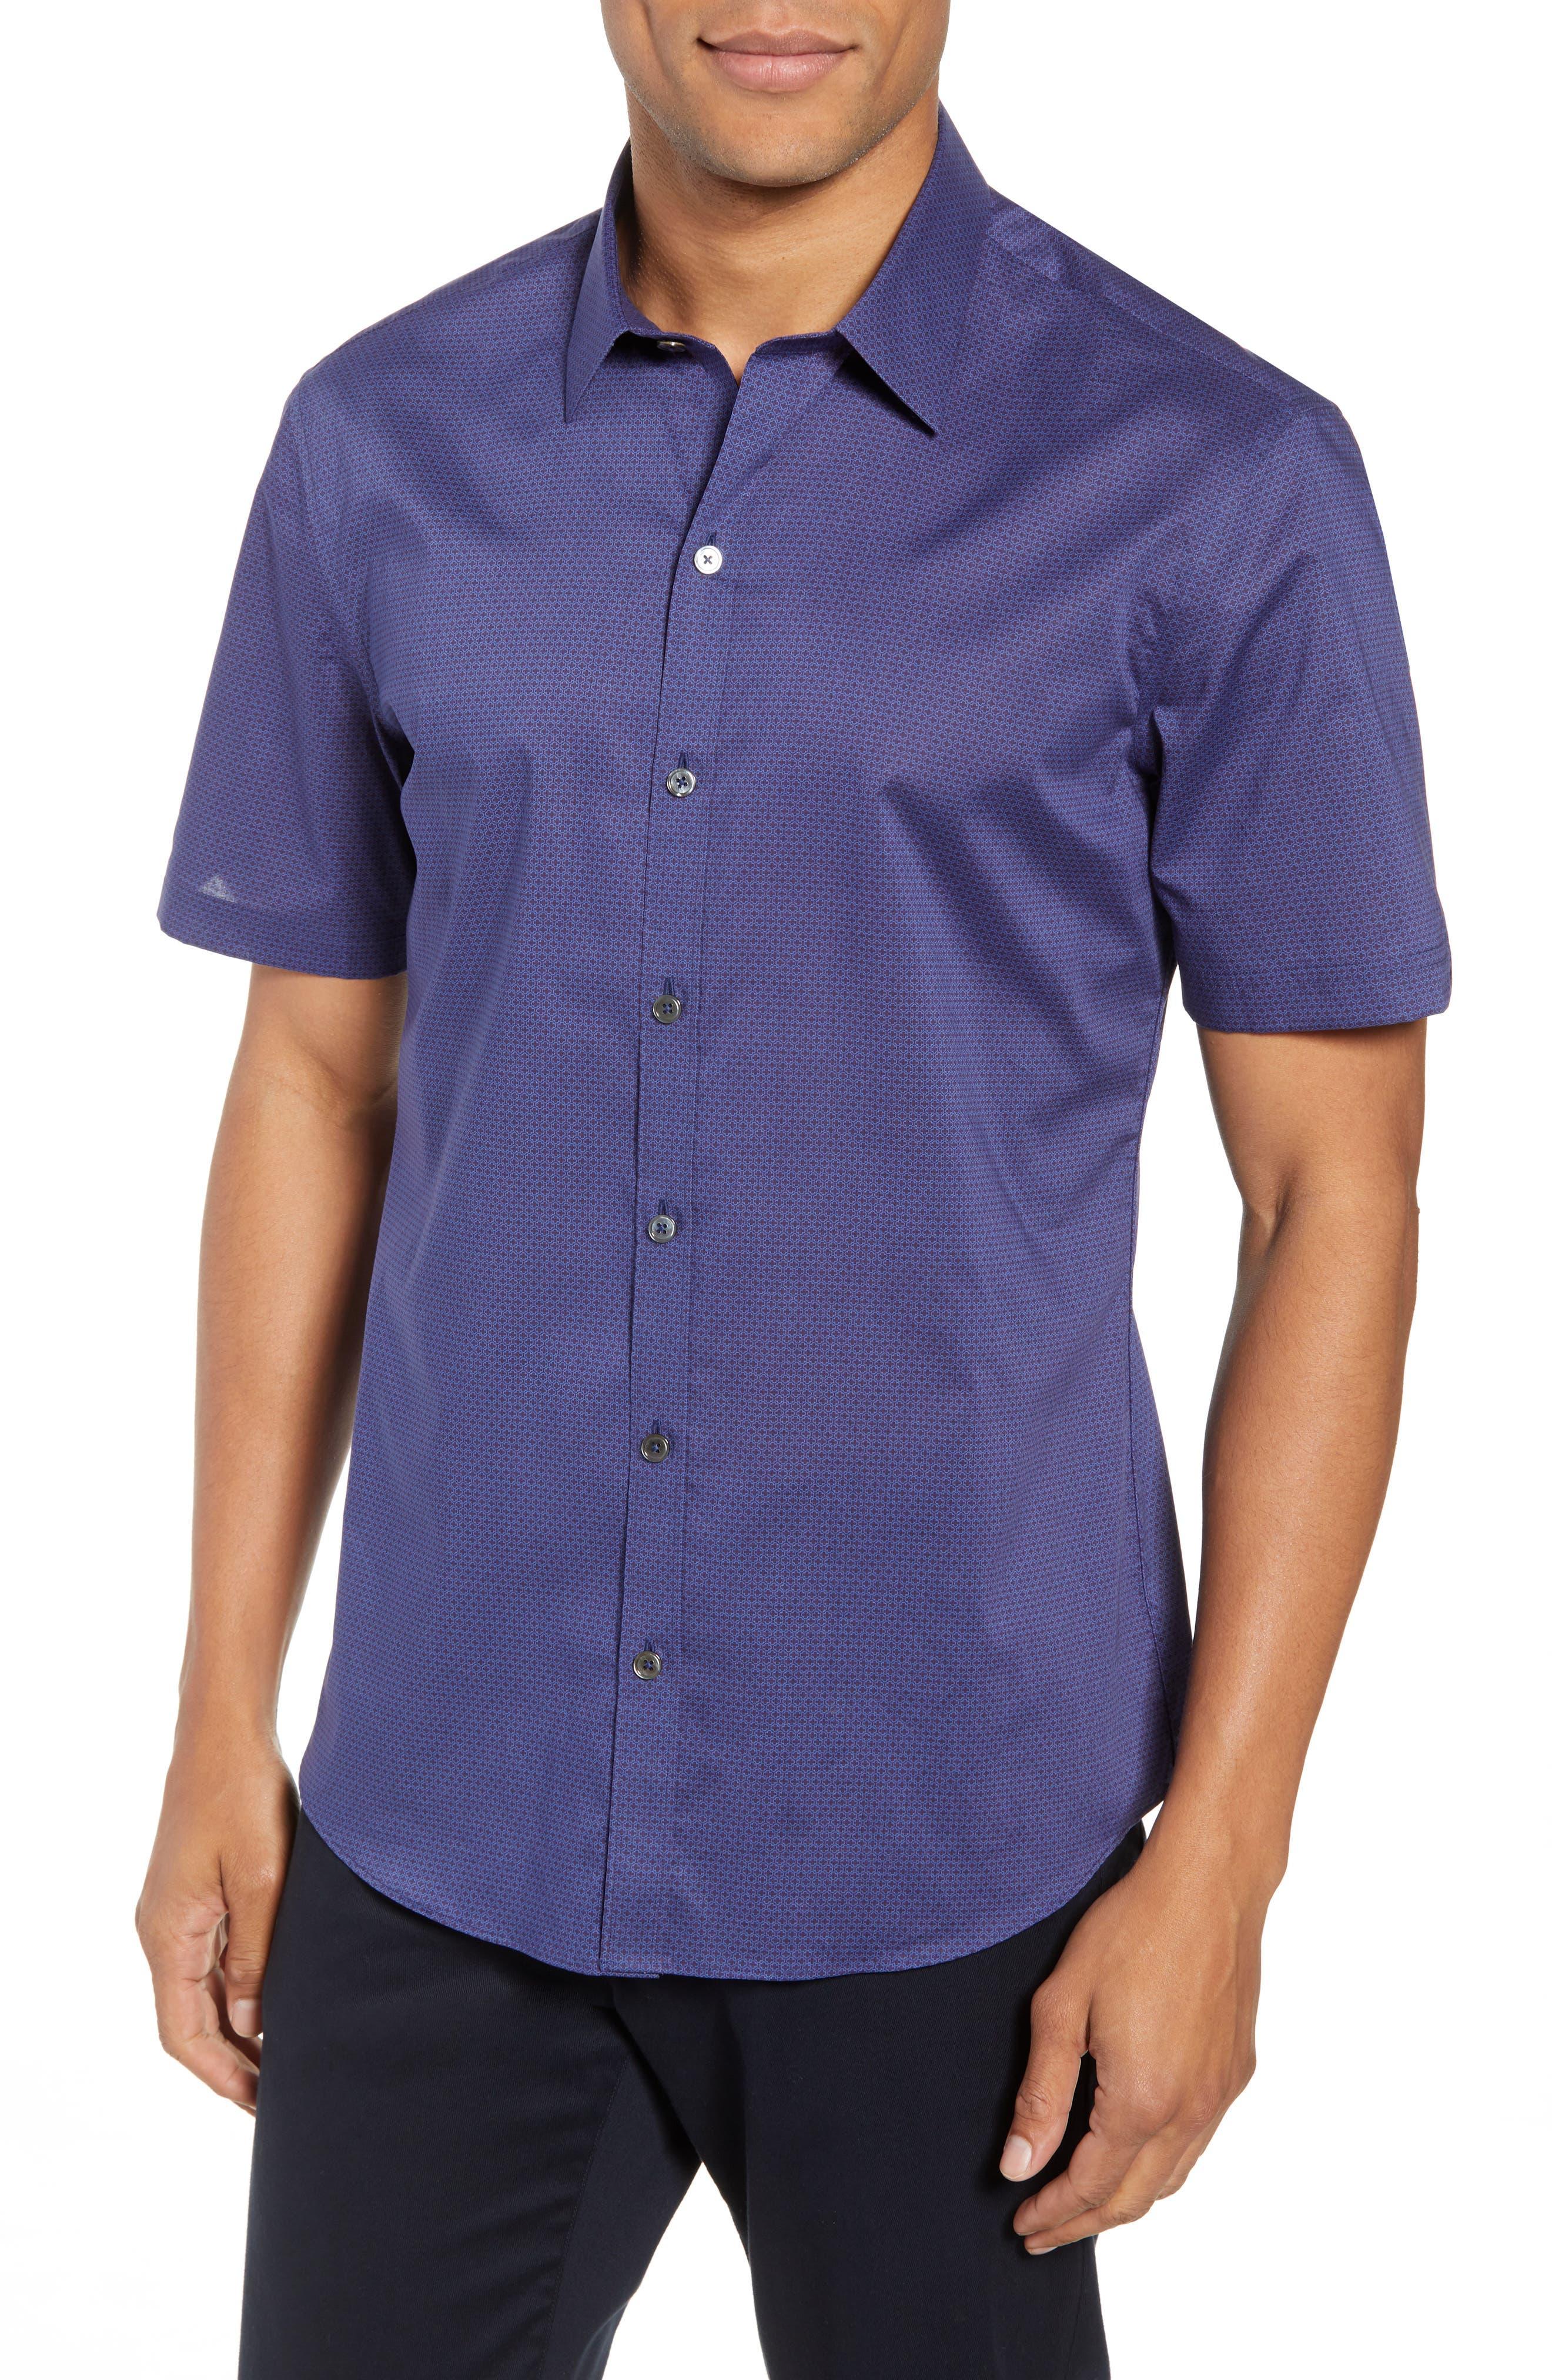 Avellan Regular Fit Sport Shirt,                             Main thumbnail 1, color,                             BLUE